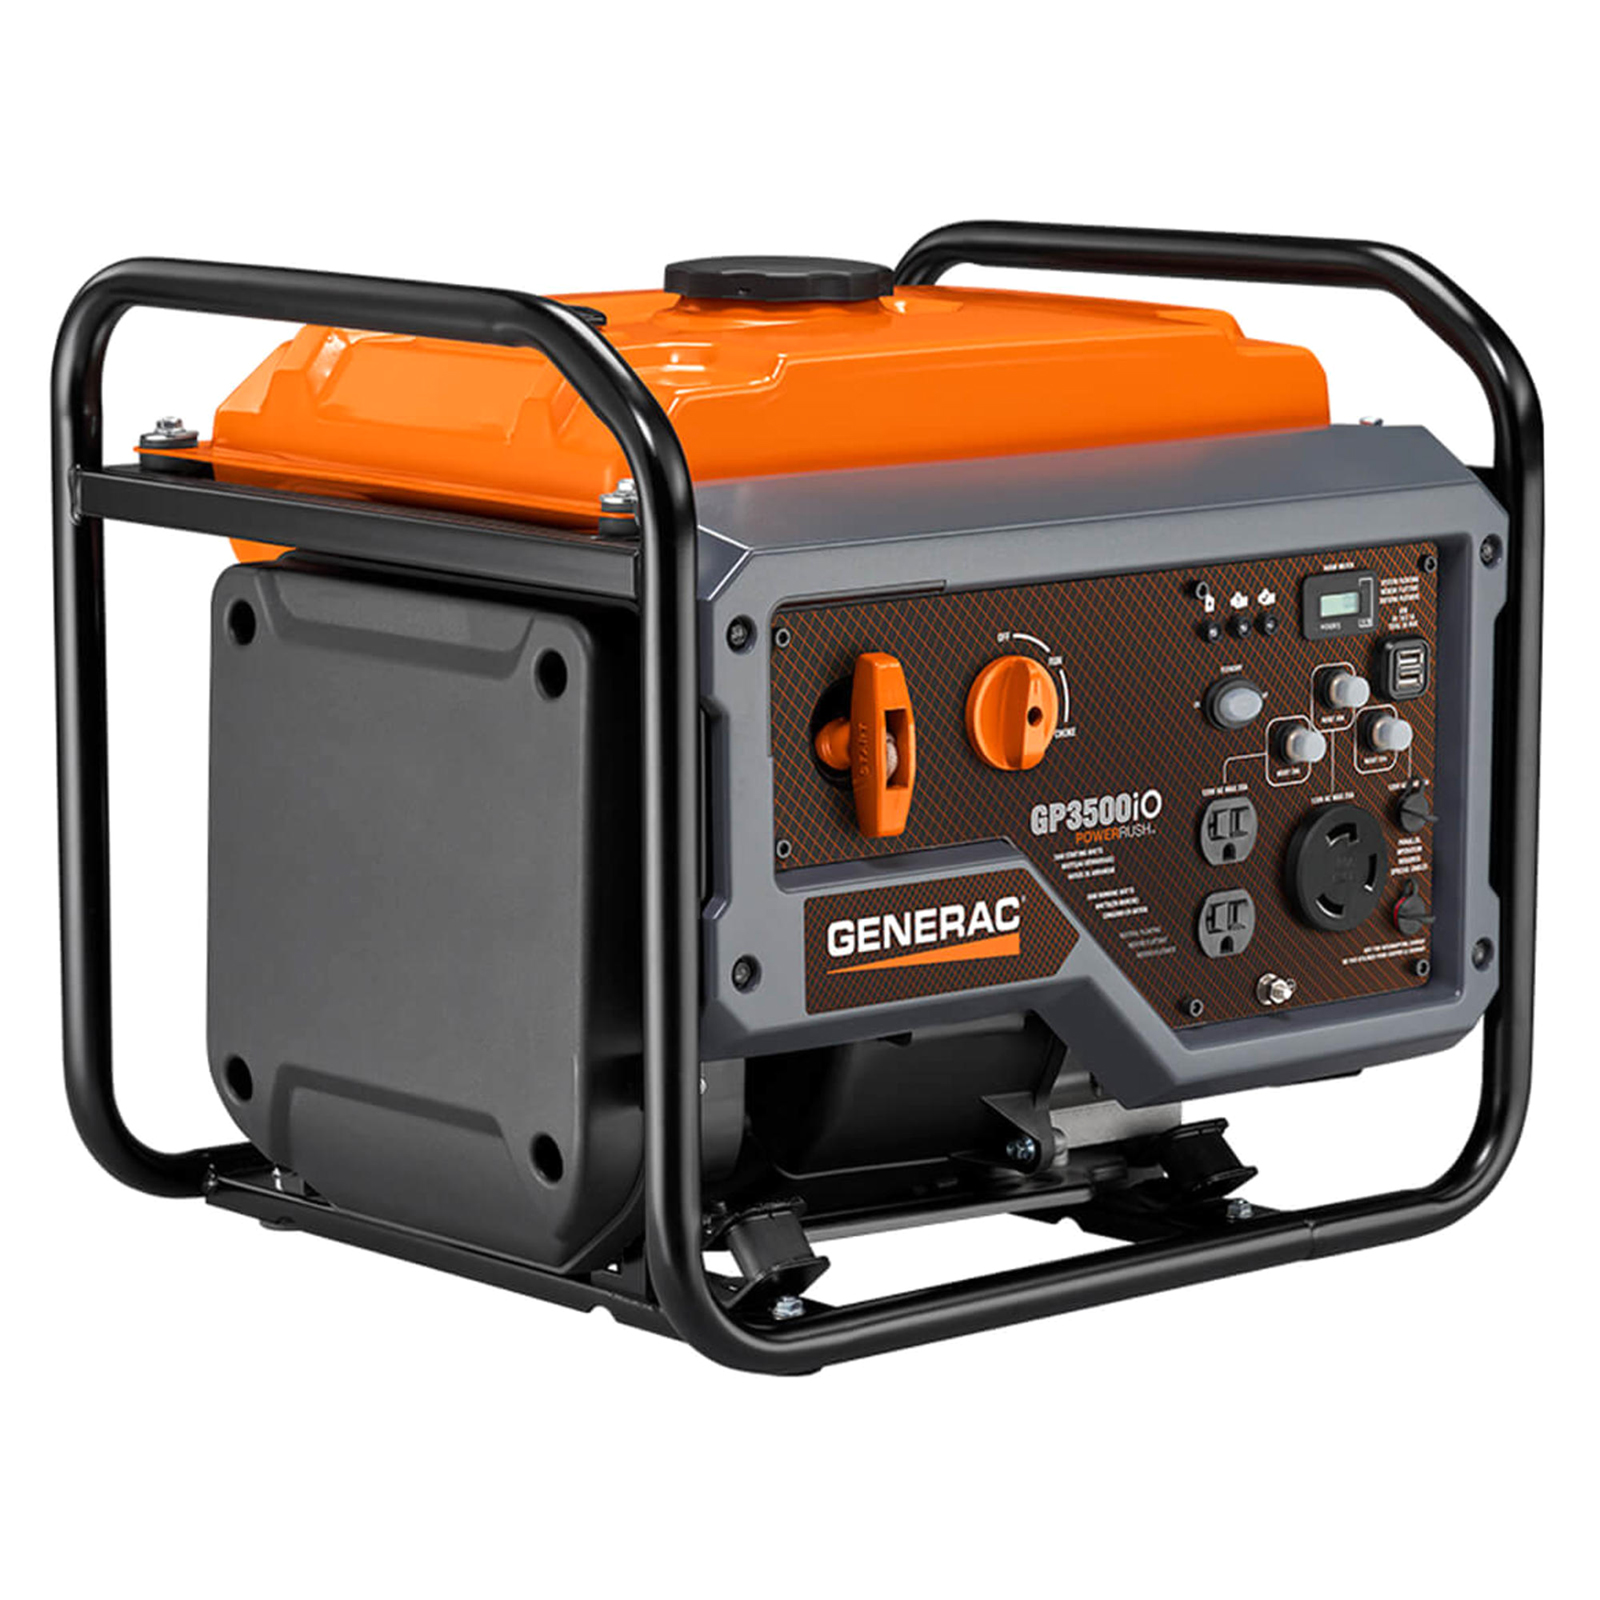 medium resolution of generac 7128 gp series 3500io 3500w portable generator with economy mode